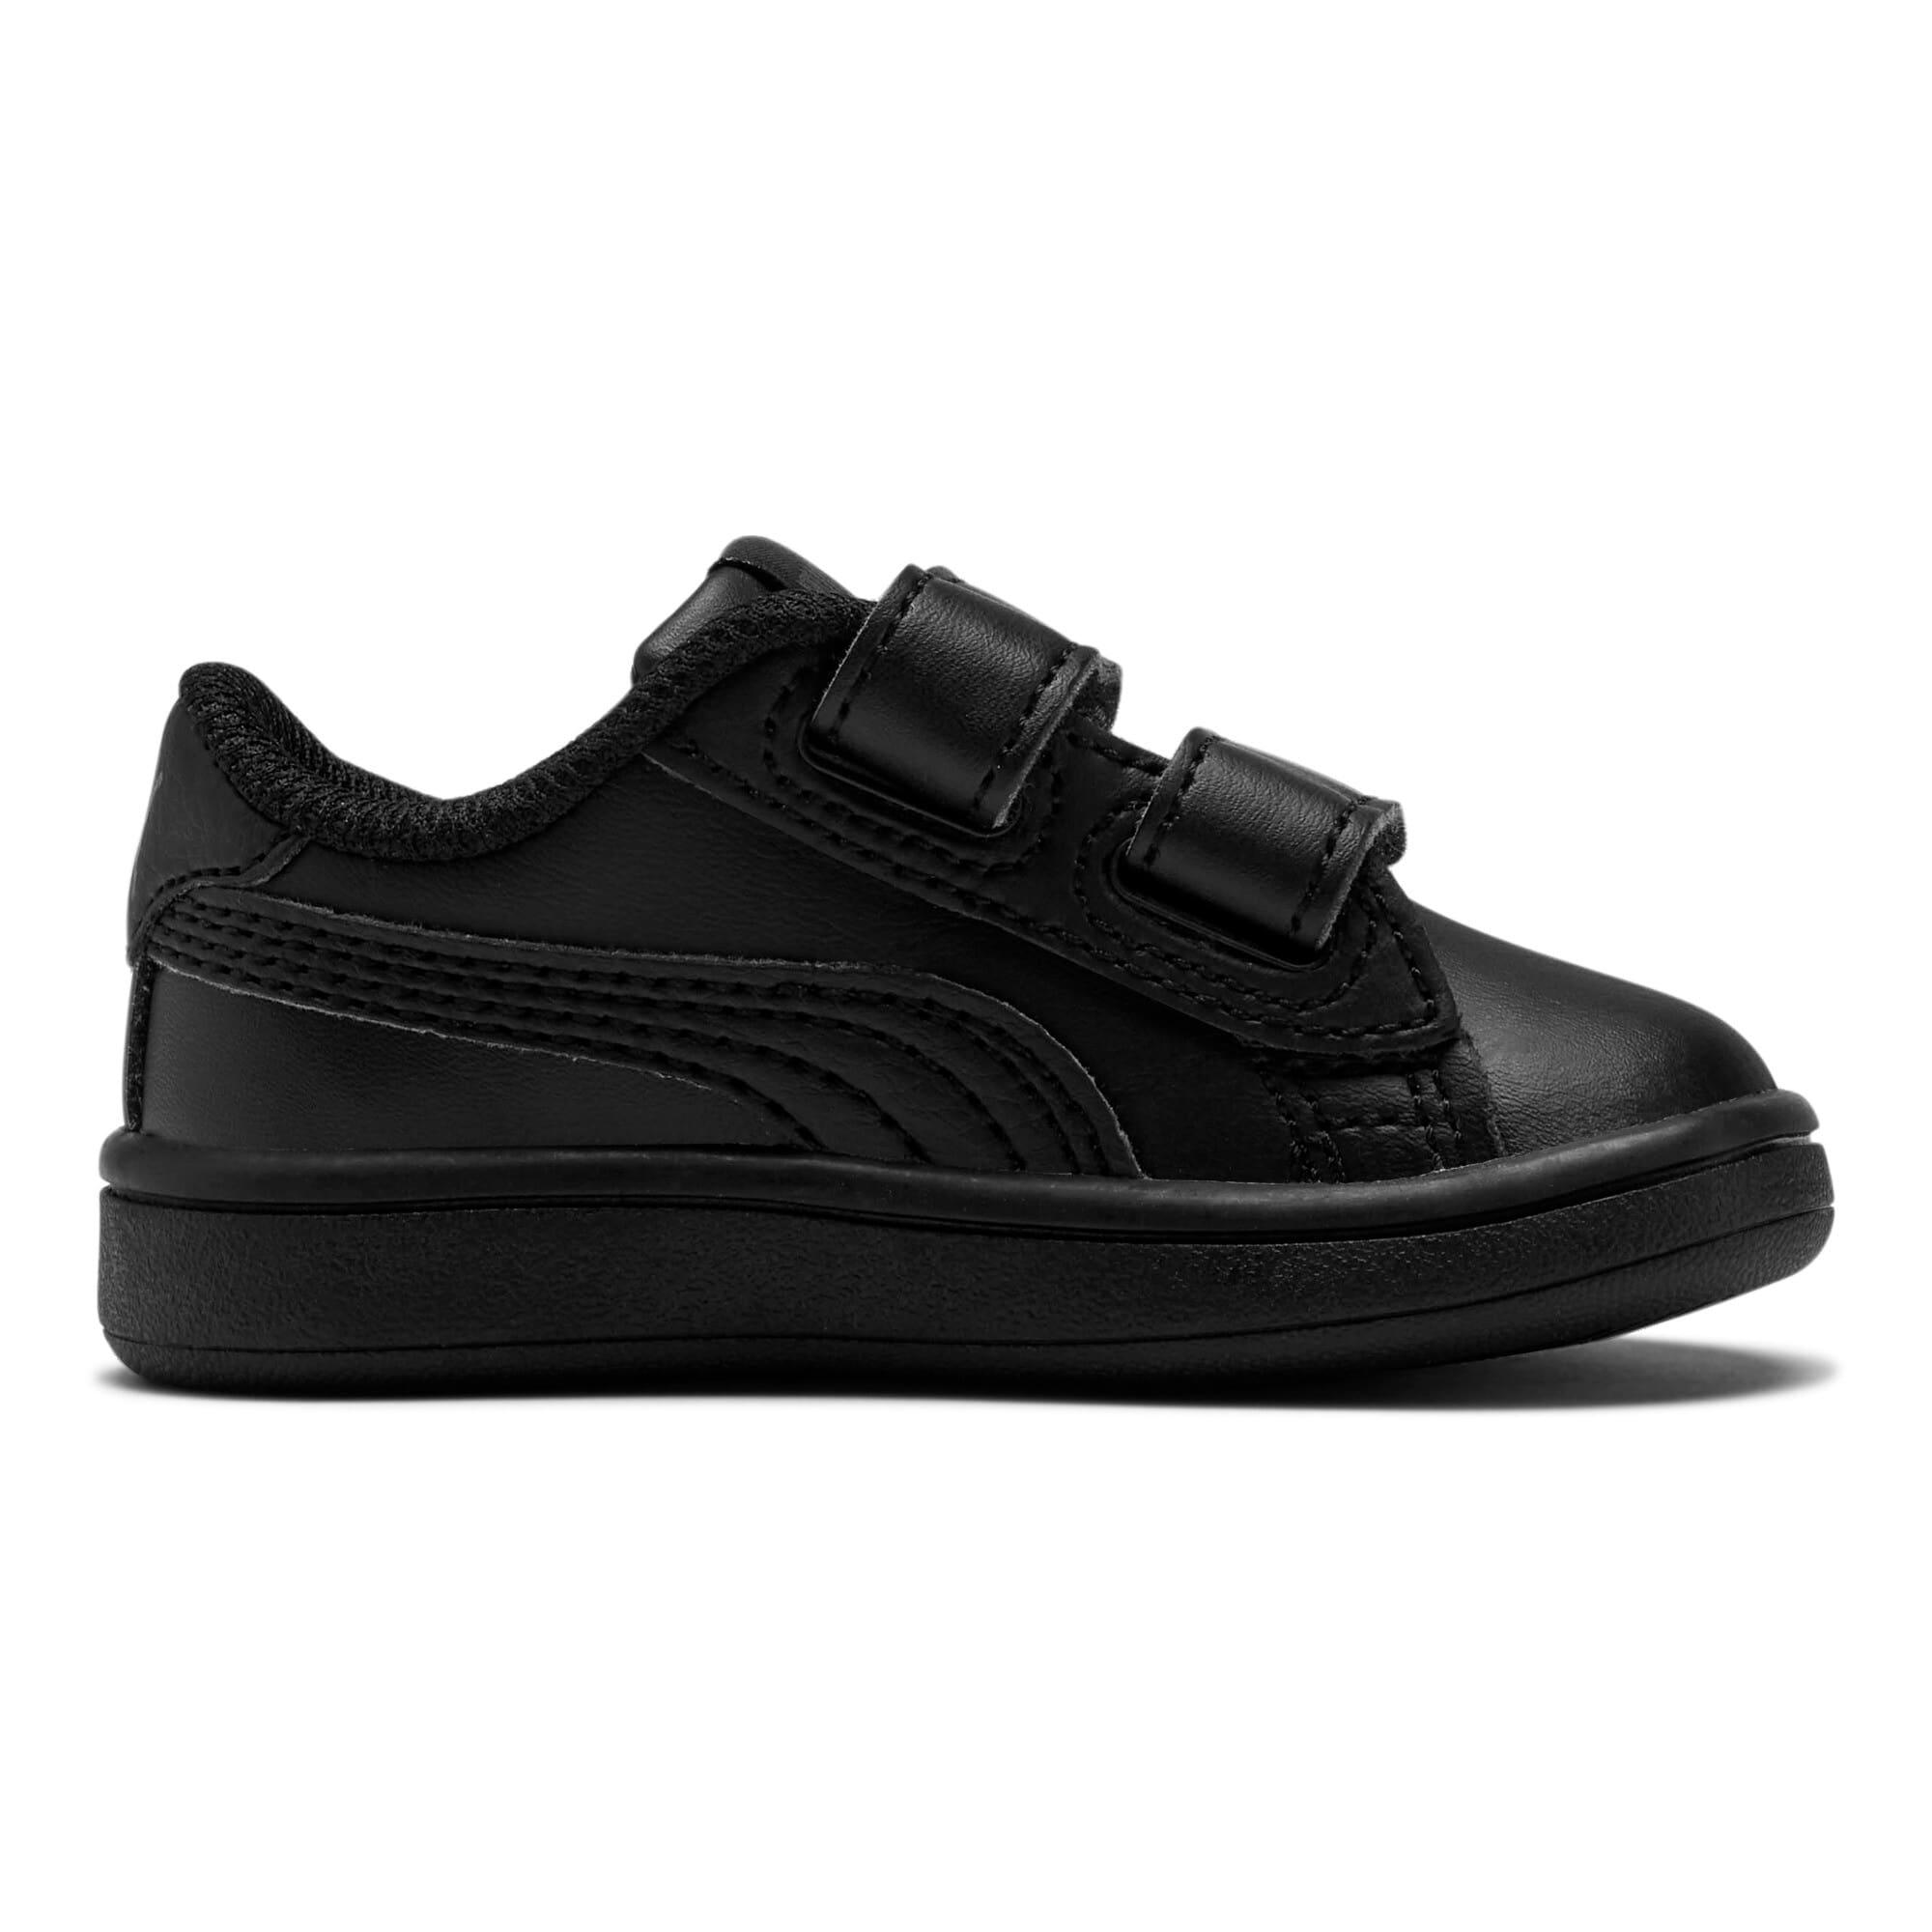 Thumbnail 5 of Puma Smash v2 L V Toddler Shoes, Puma Black-Puma Black, medium